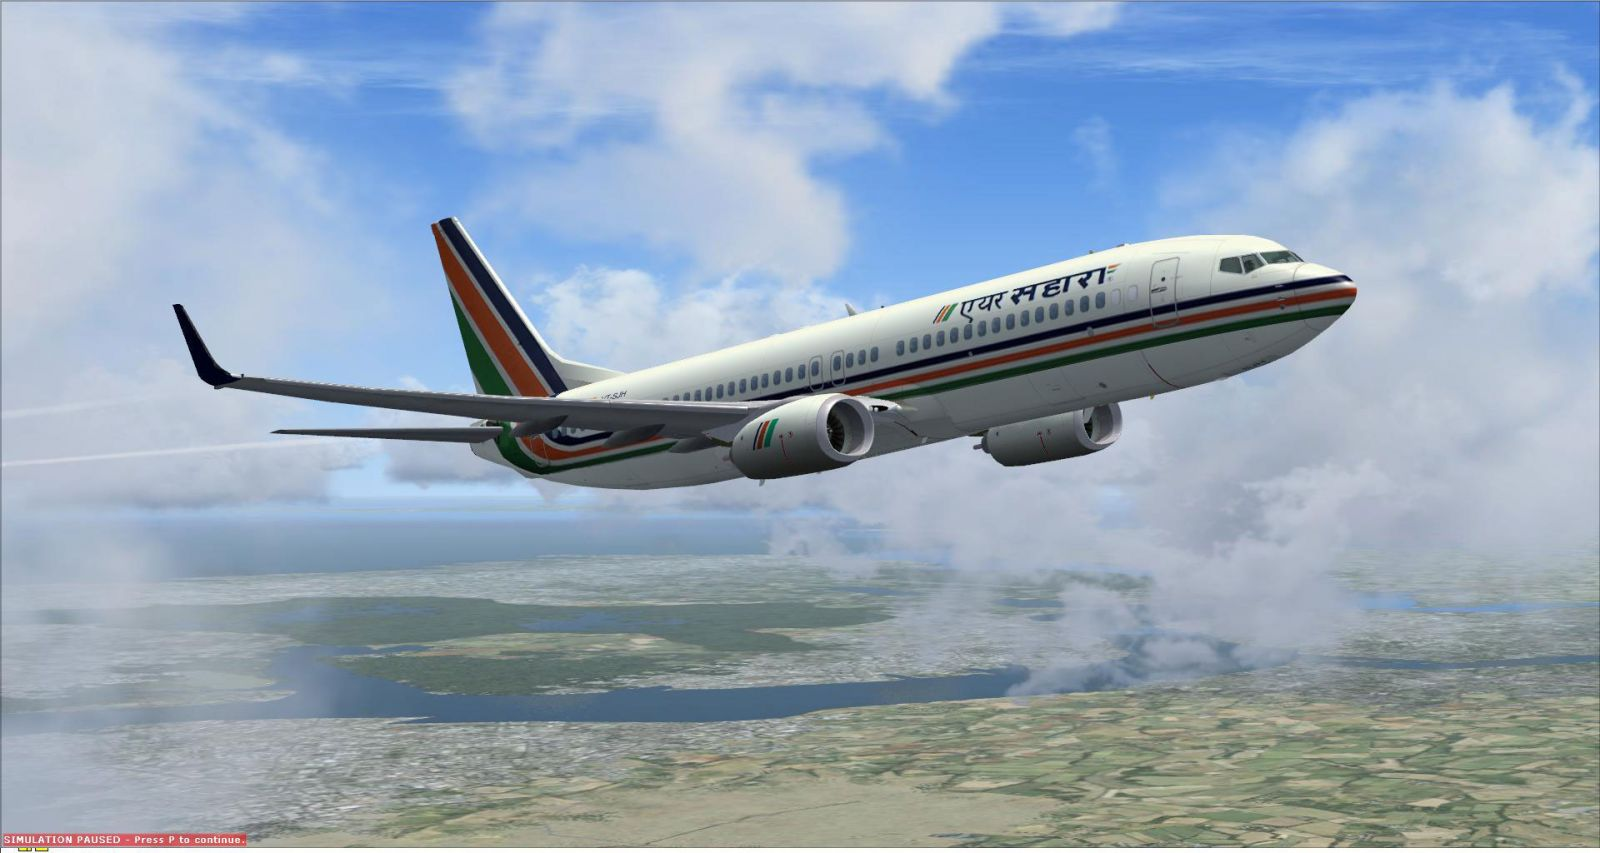 boeing 737 aircraft aviation - photo #17